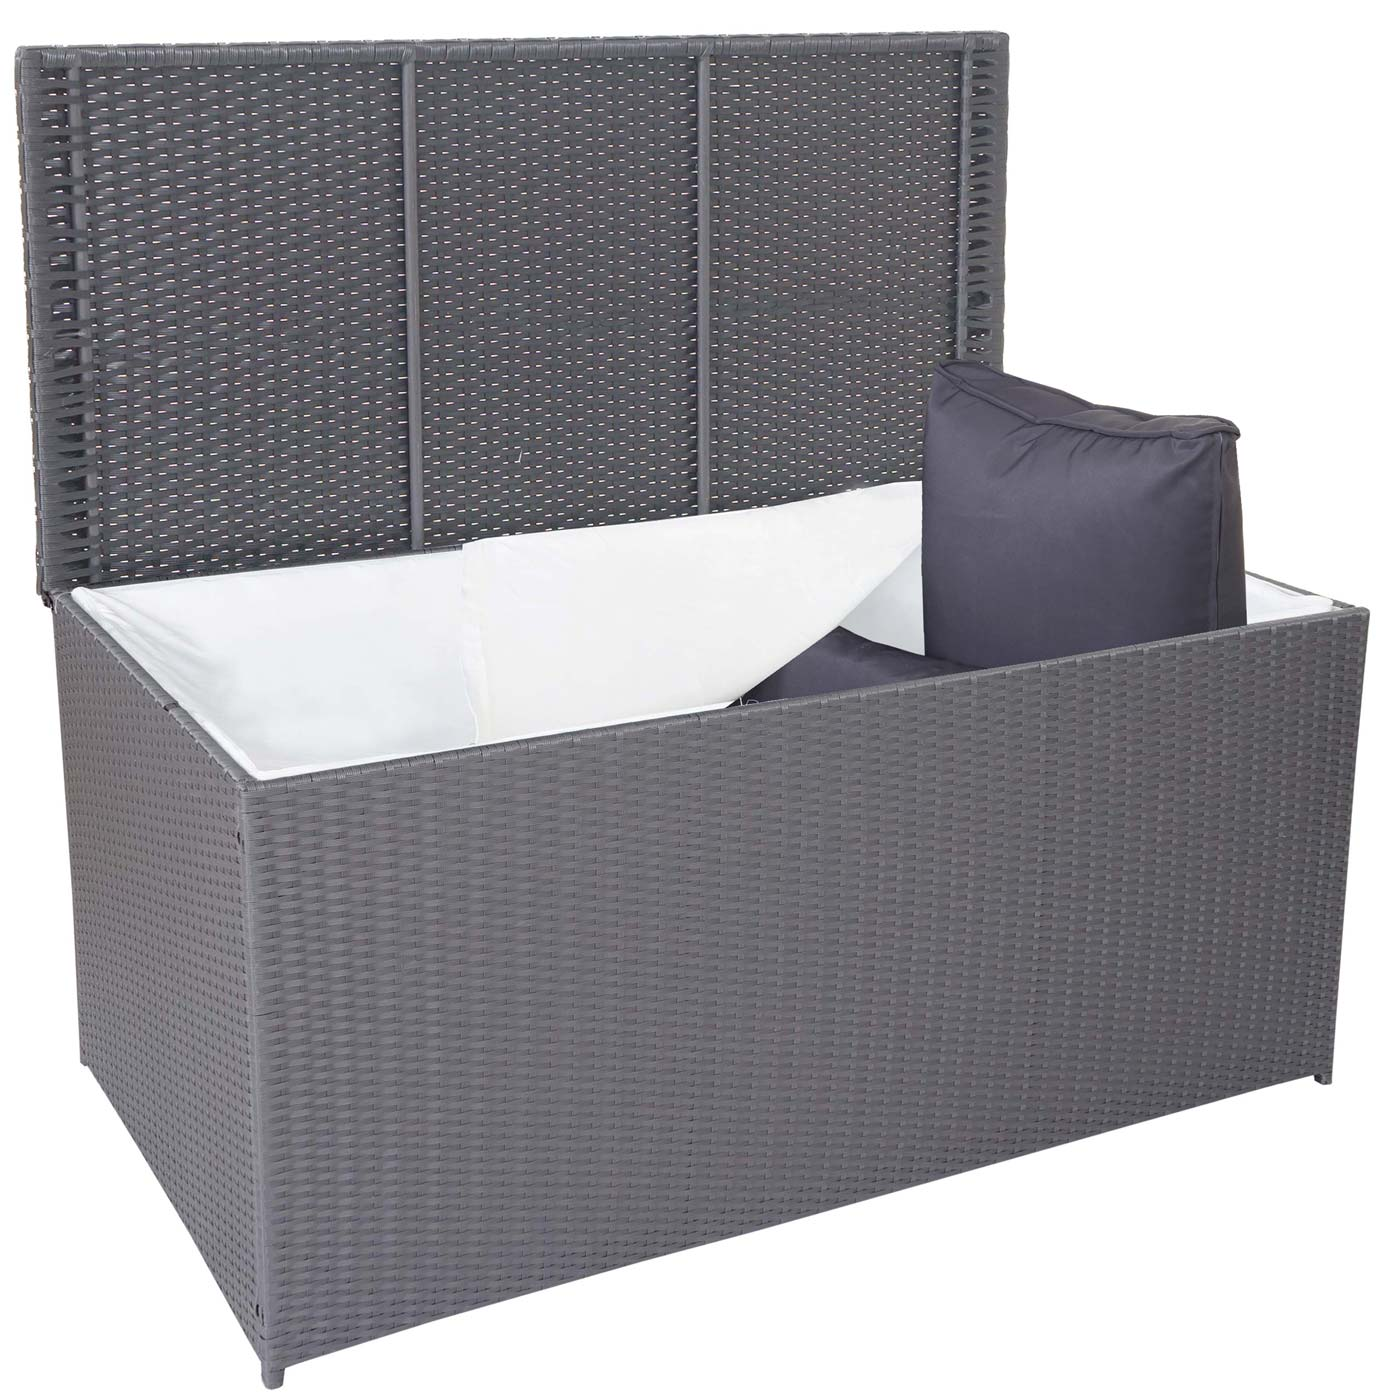 poly rattan kissenbox bury truhe auflagenbox gartenbox. Black Bedroom Furniture Sets. Home Design Ideas